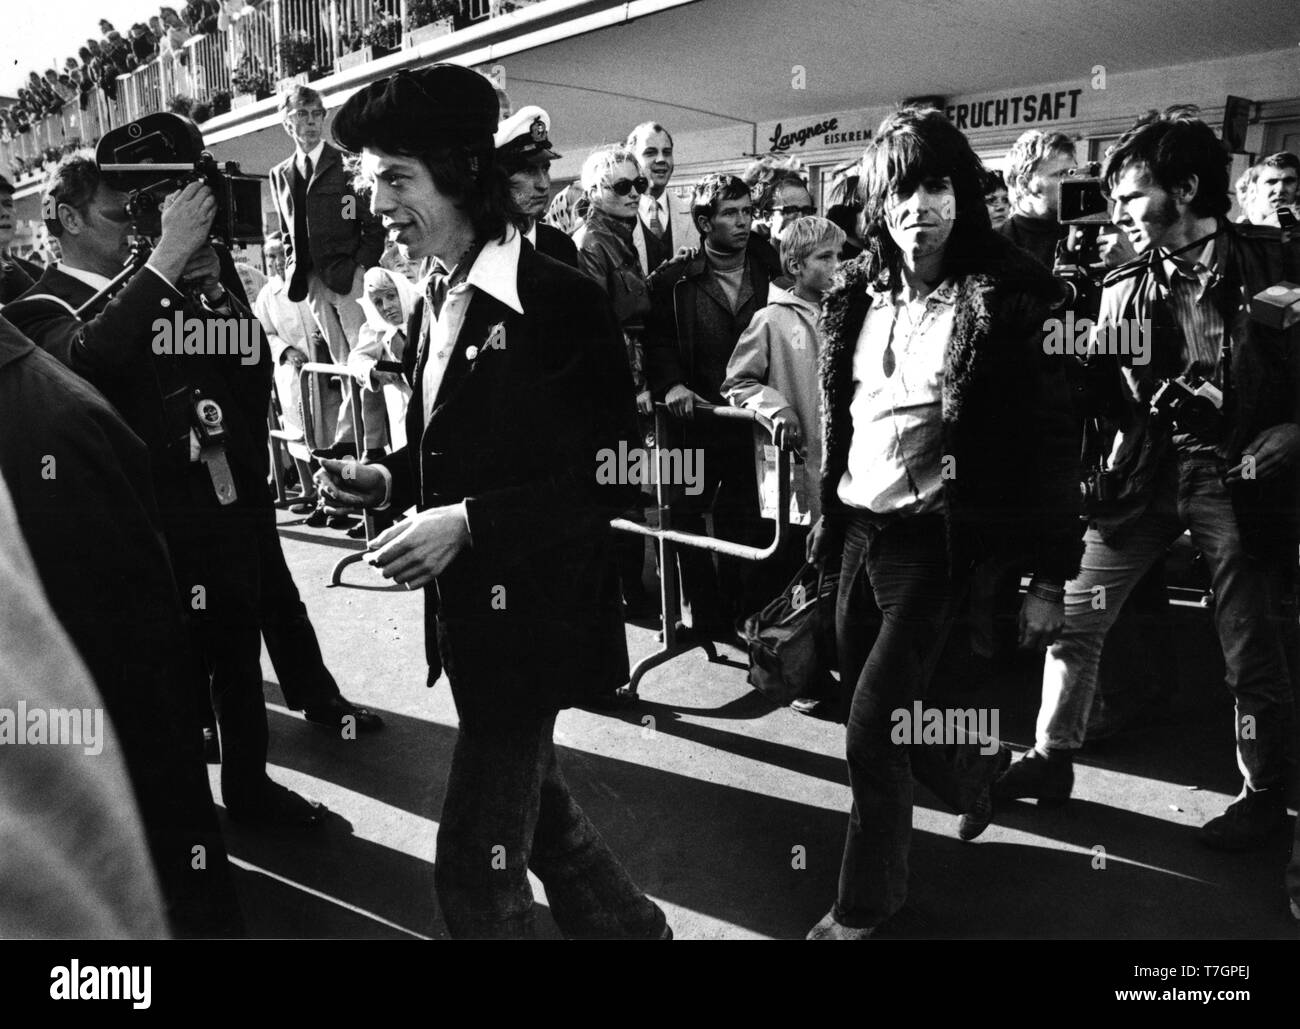 1970 september 13th, Hamburg, Germany -   (Photo Gijsbert Hanekroot) *** Local Caption *** Mick Jagger, Keith Richards, Rolling Stones - Stock Image